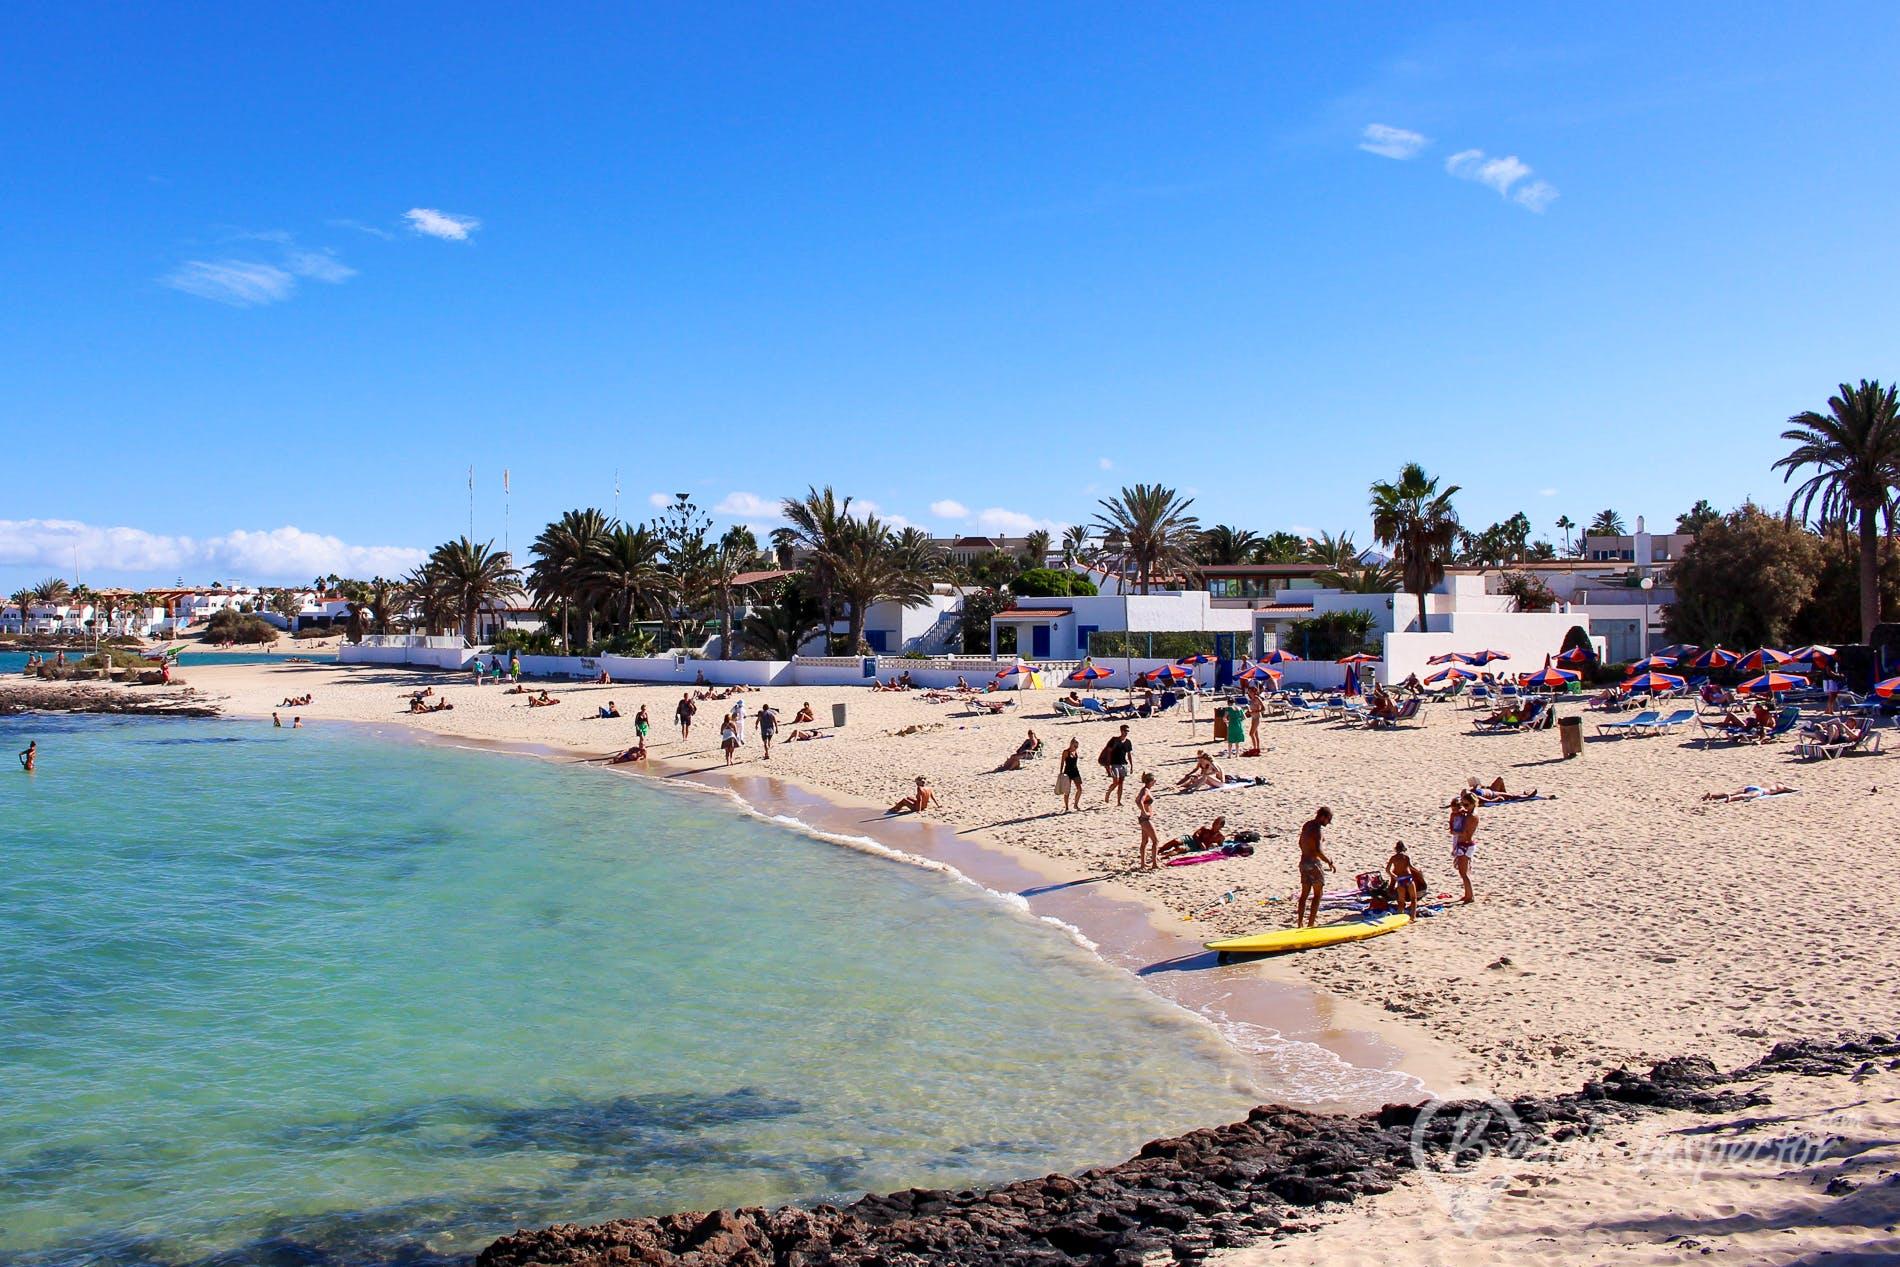 Beach Playa Hoplaco, Fuerteventura, Spain